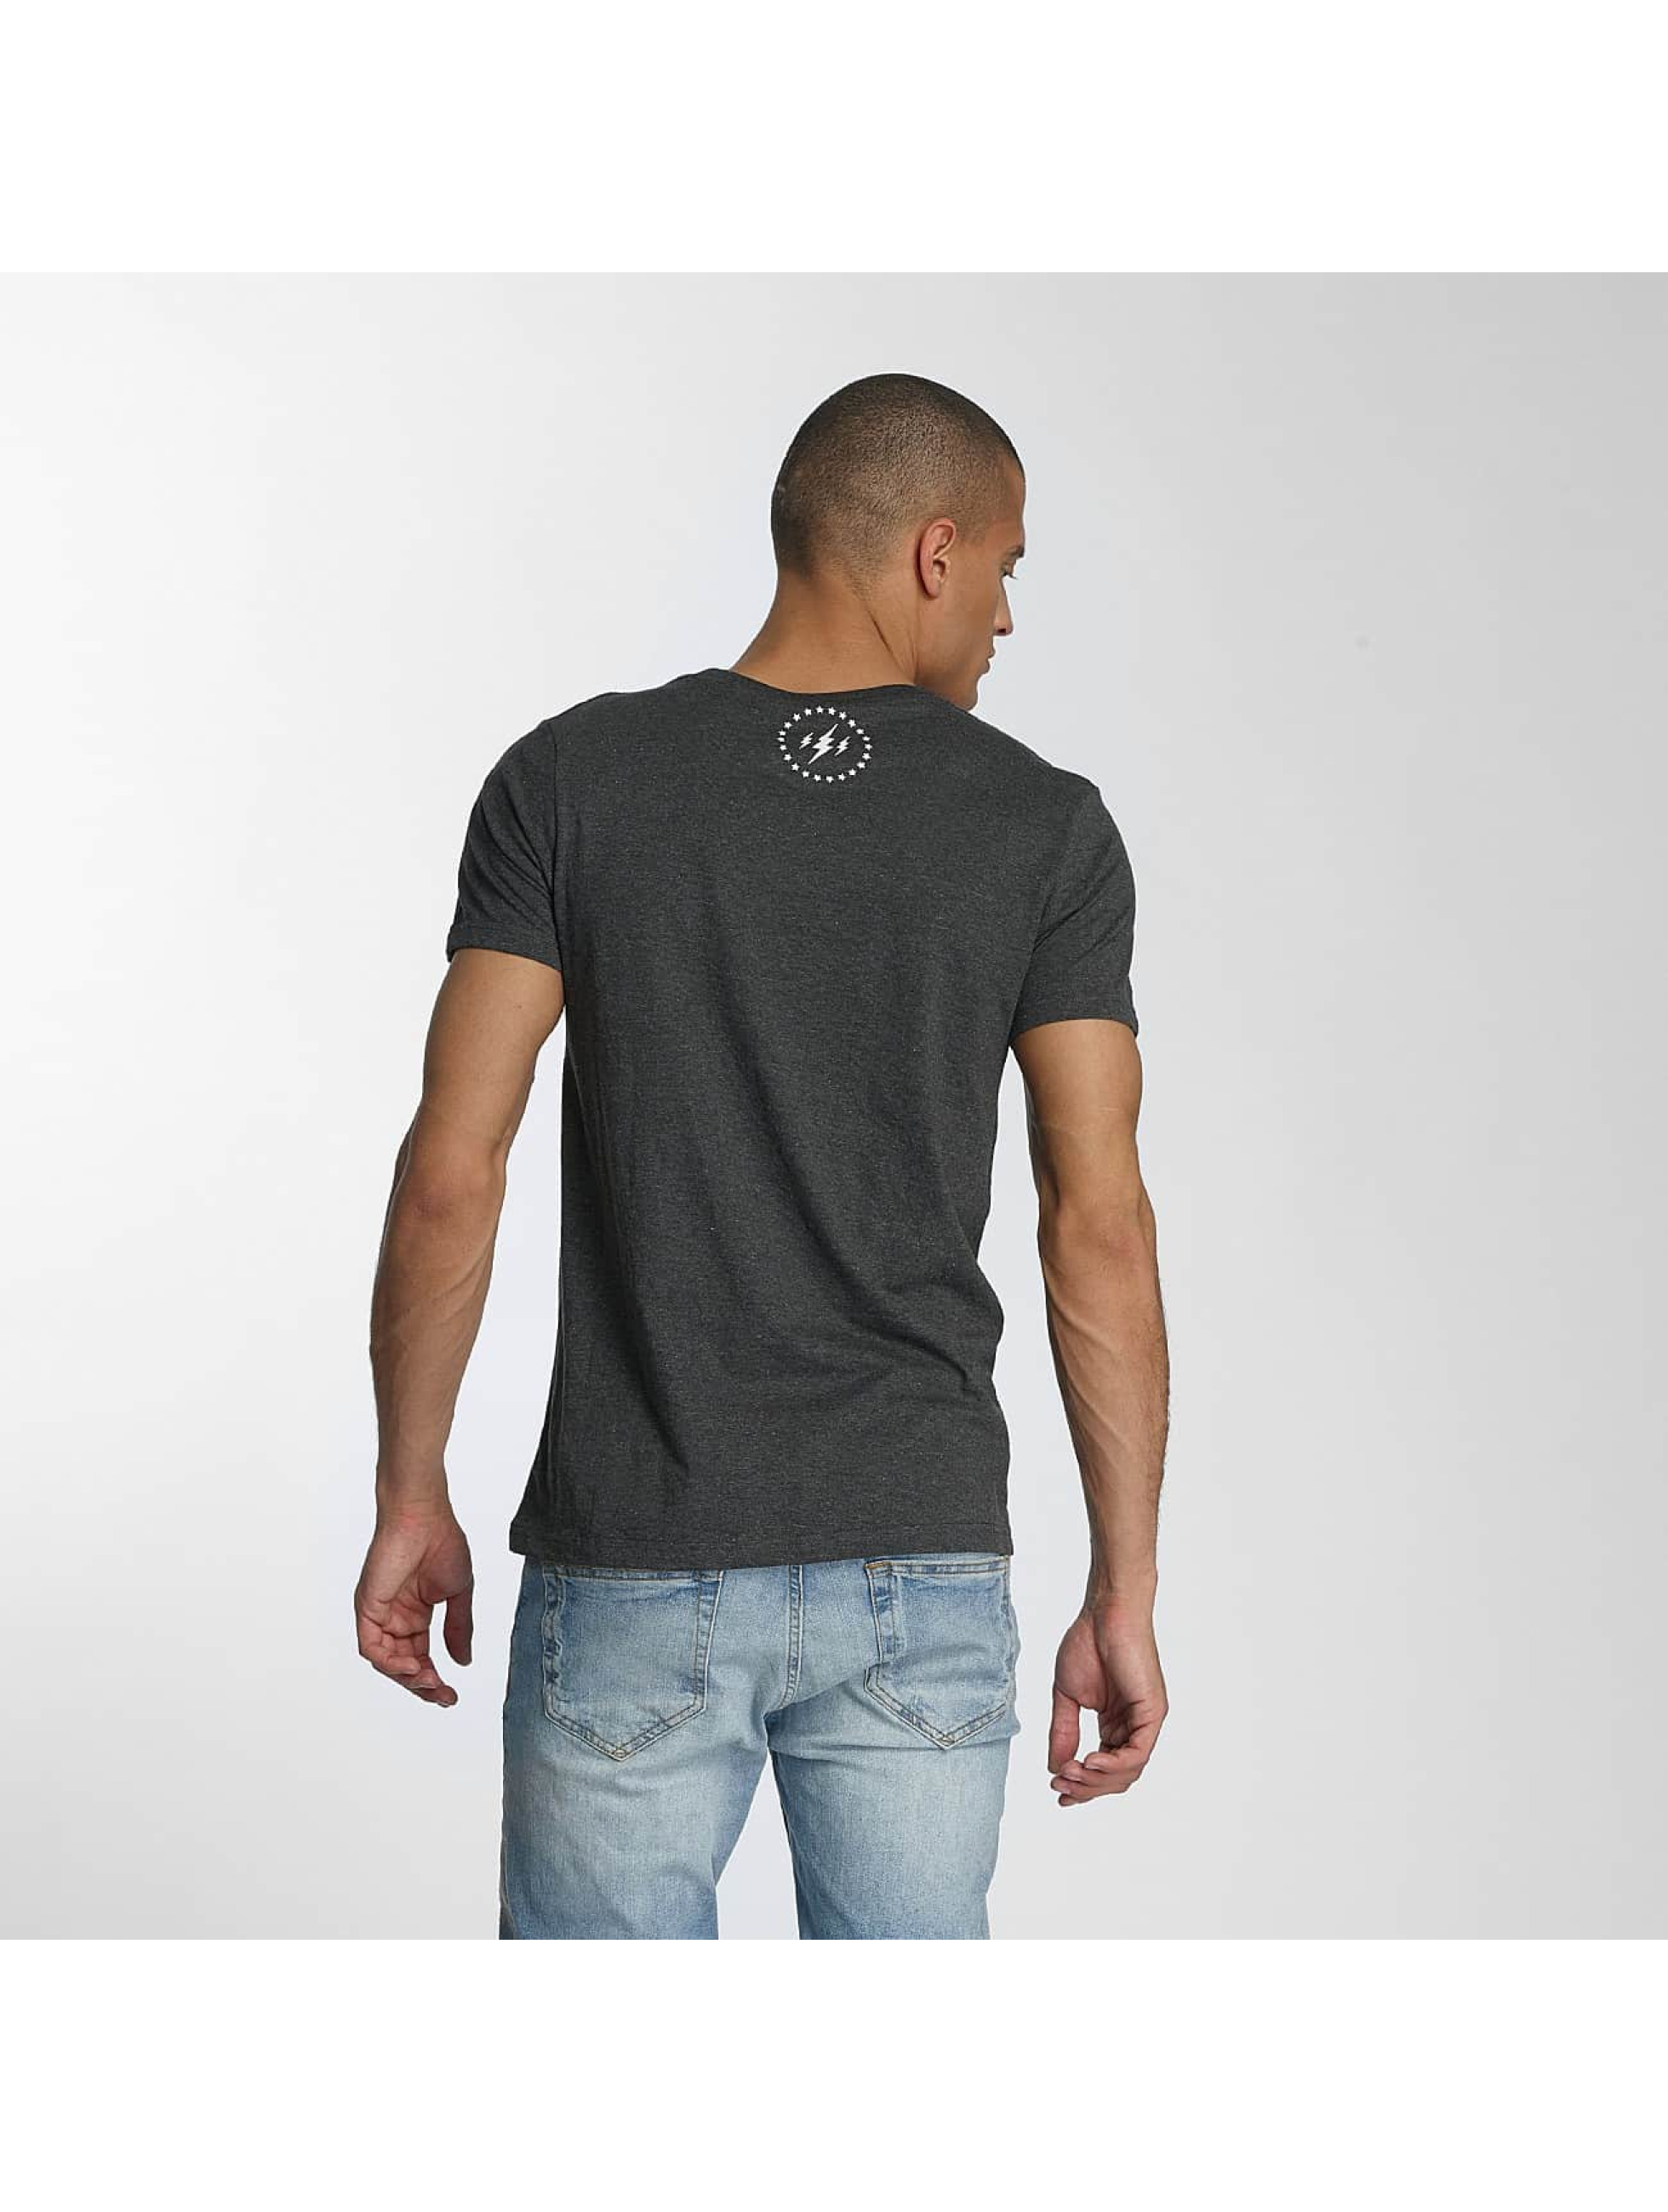 TrueSpin T-Shirt 5 grey